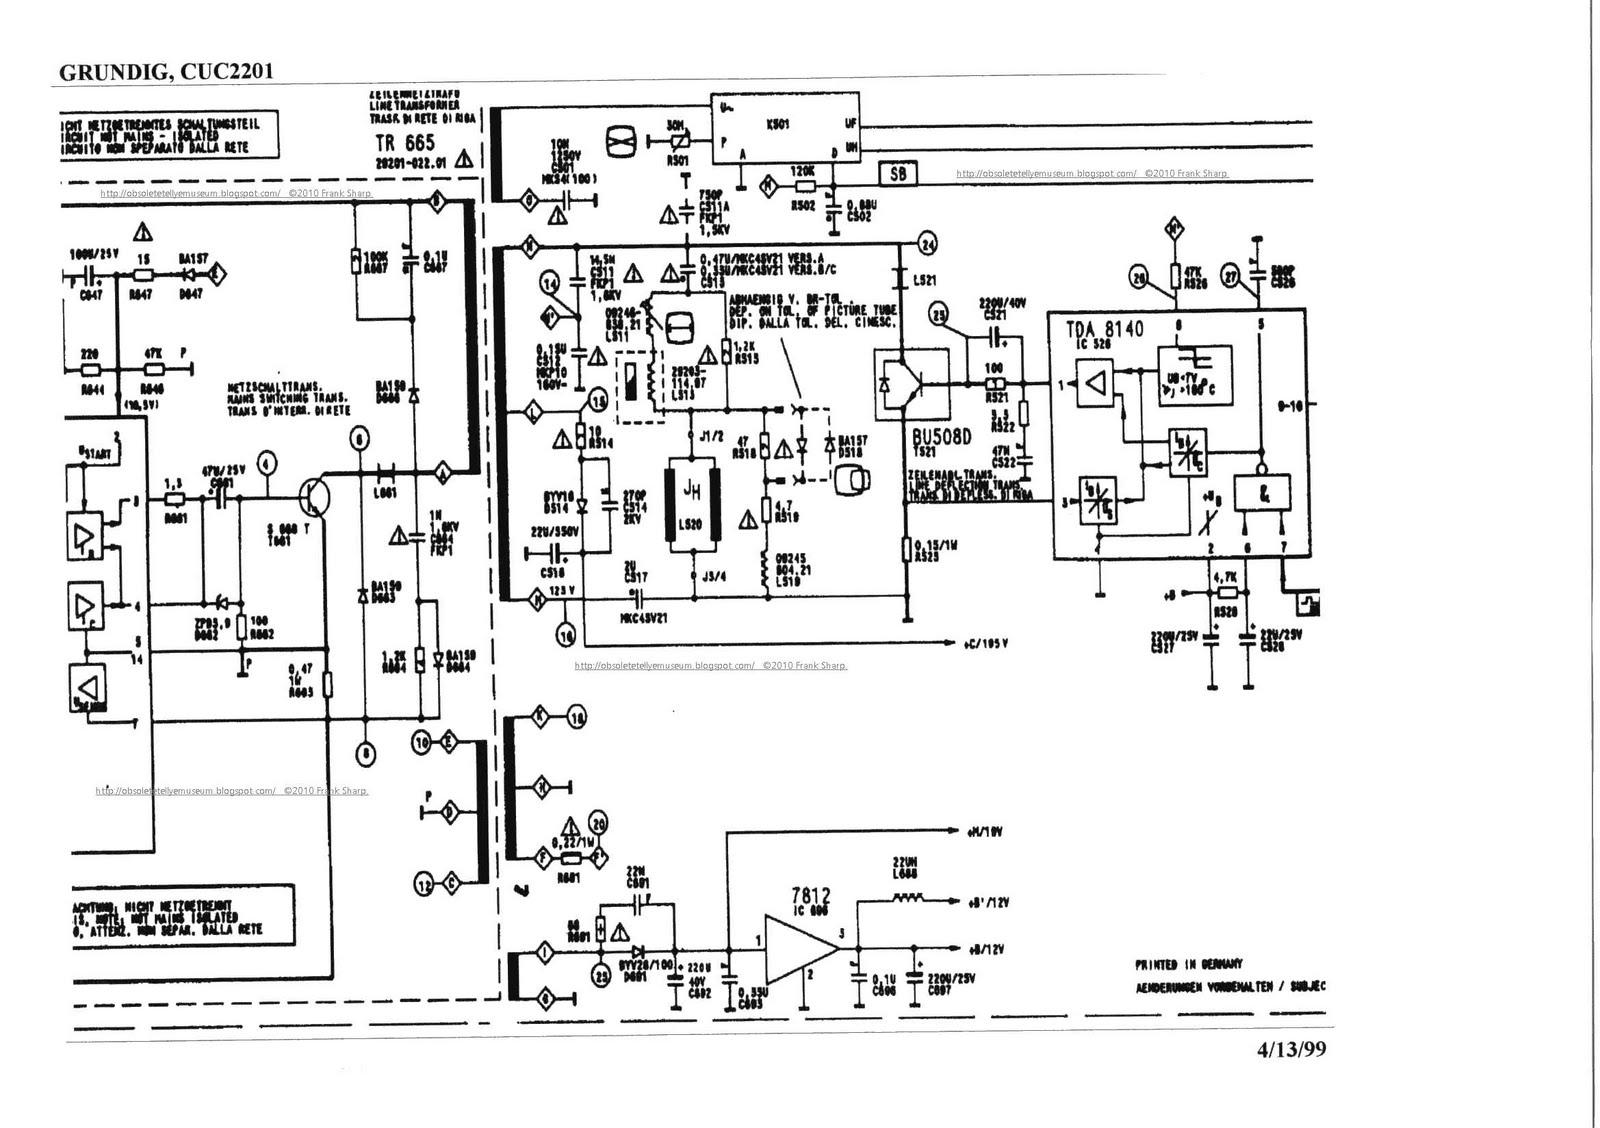 Obsolete Technology Tellye !: GRUNDIG SUPER COLOR P37-222